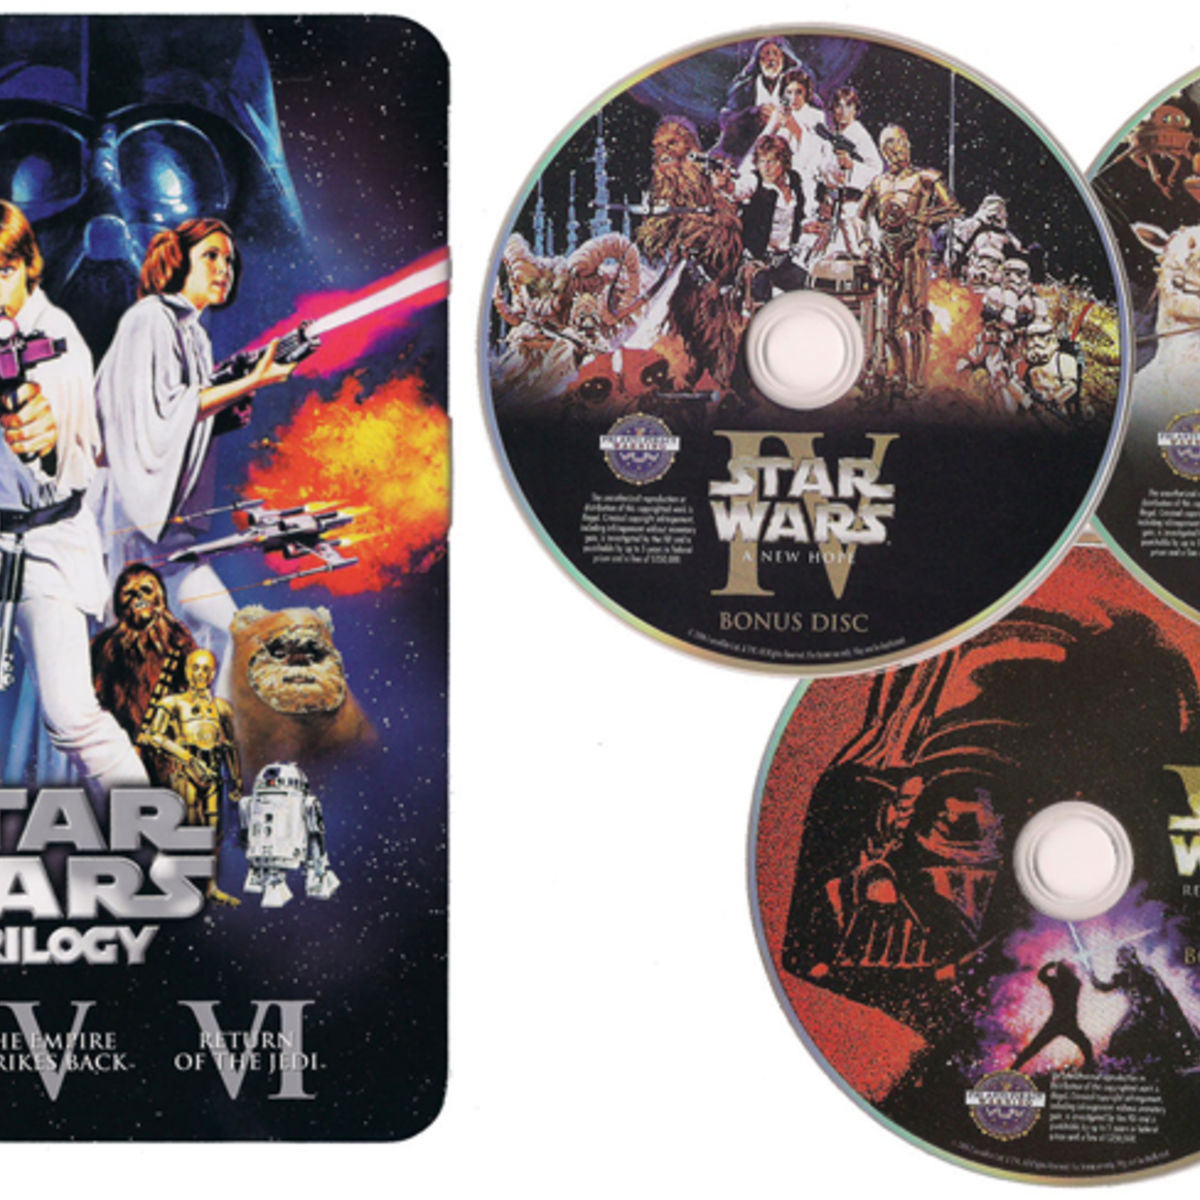 Star-Wars-2006-DVD-Best-Buy.jpg